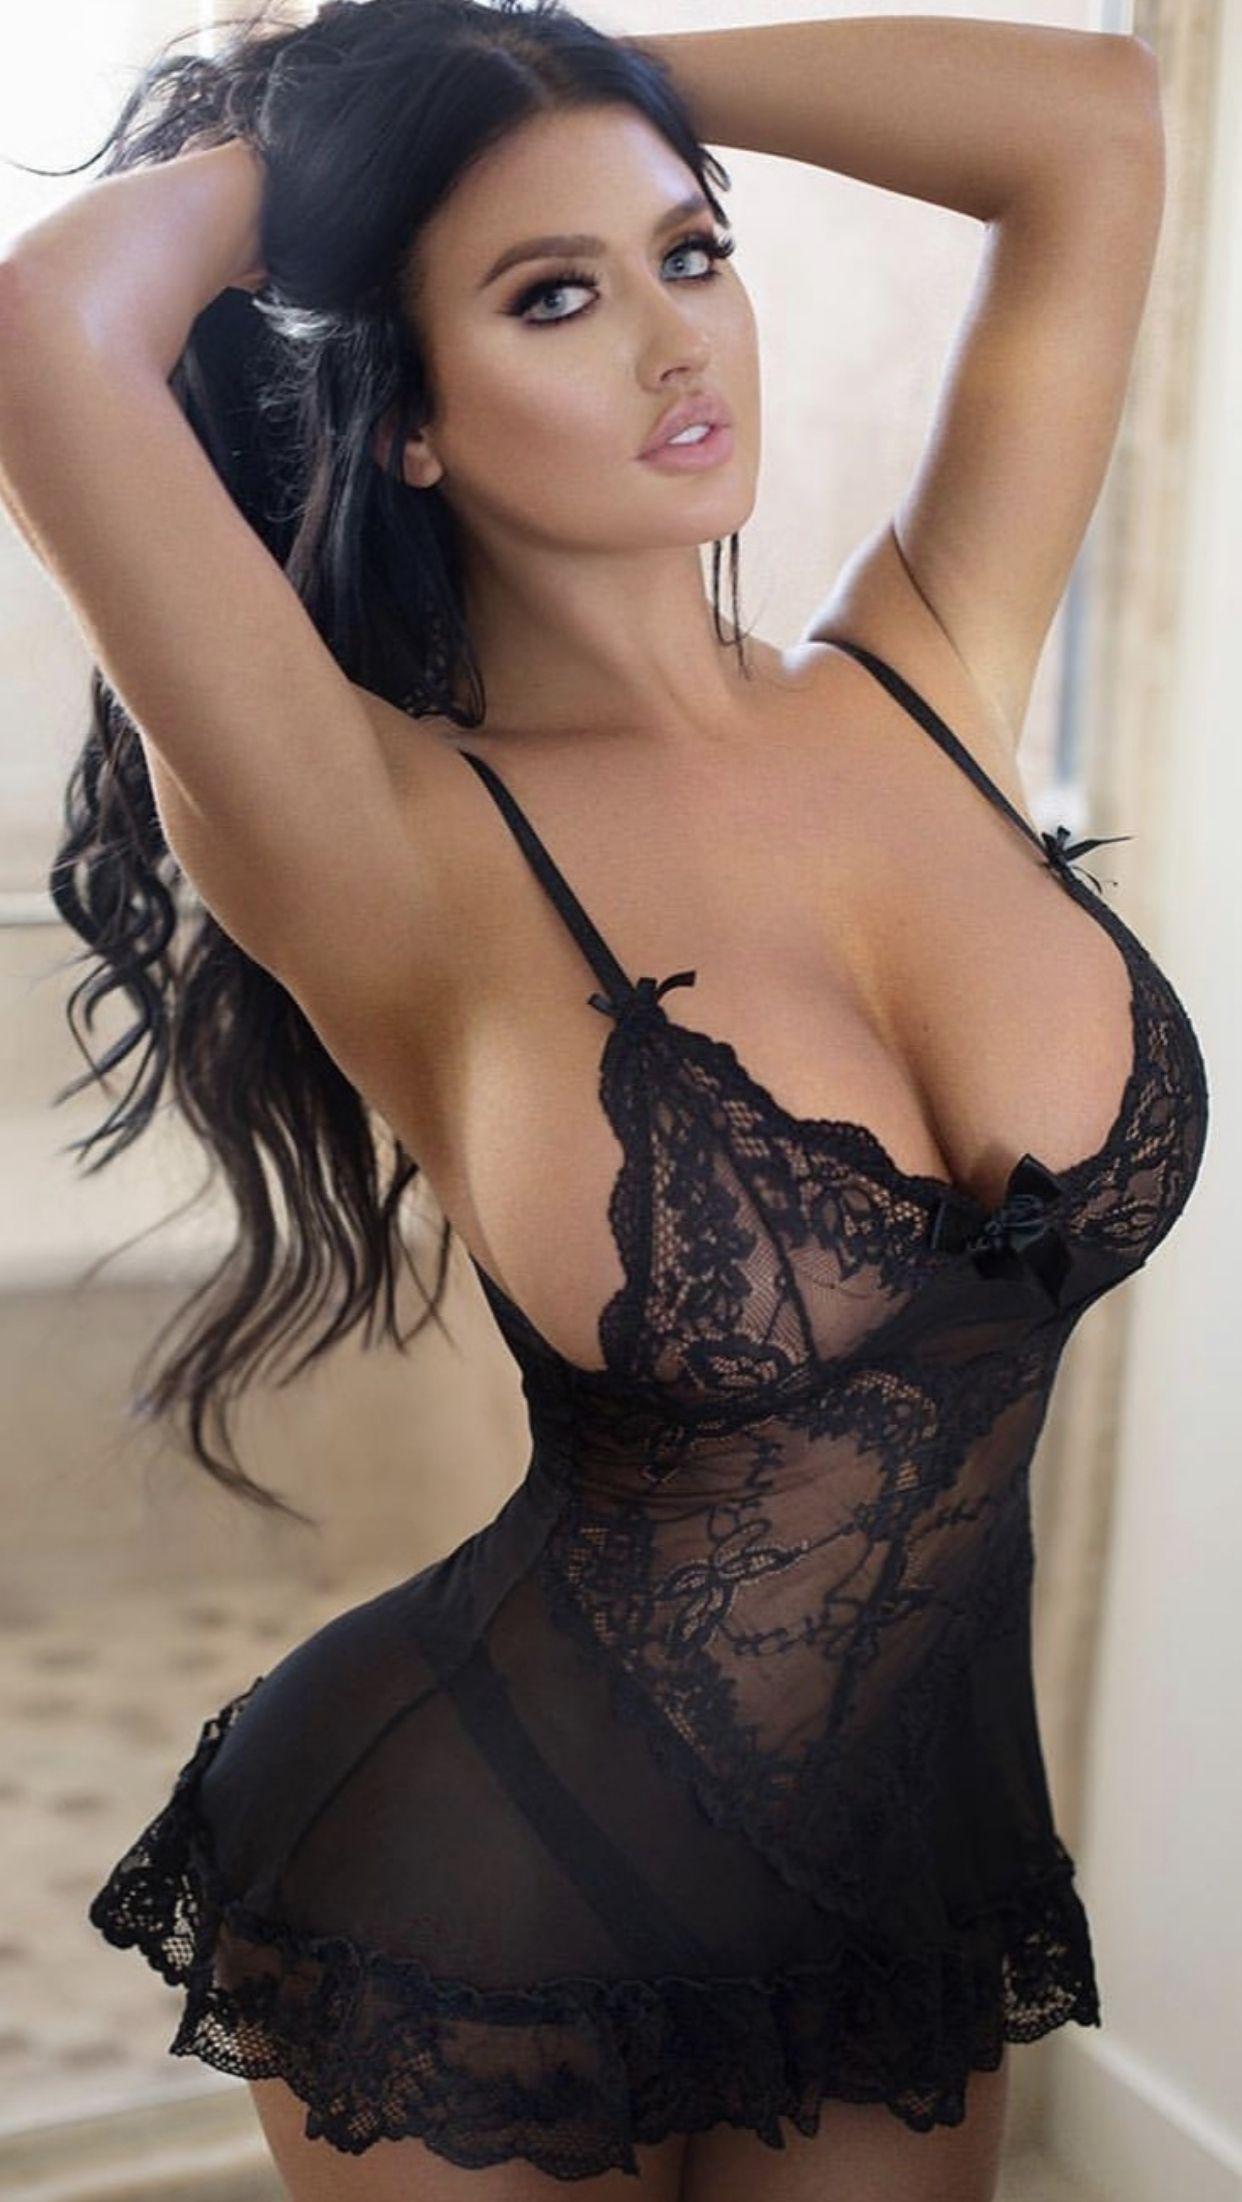 Erotic lingerie for busty women